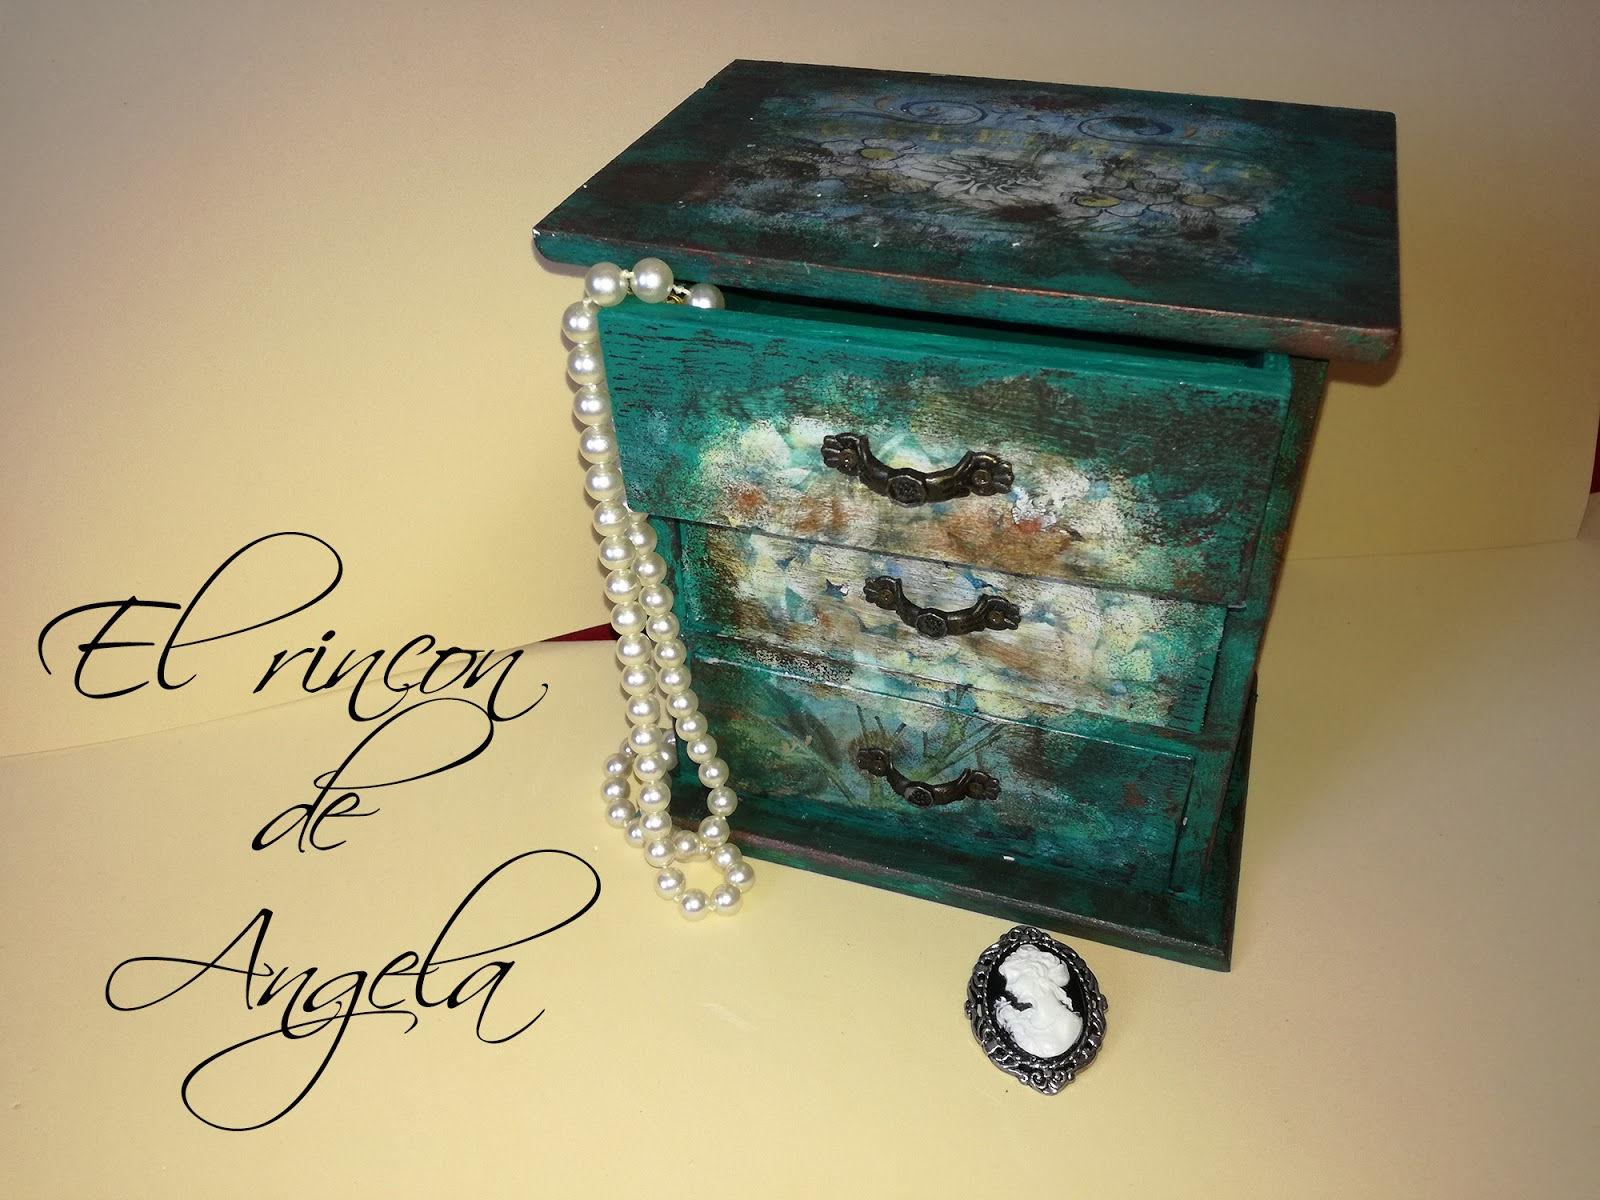 El rincon de angela decoupage con papel de folio joyero - Pintura para decoupage ...